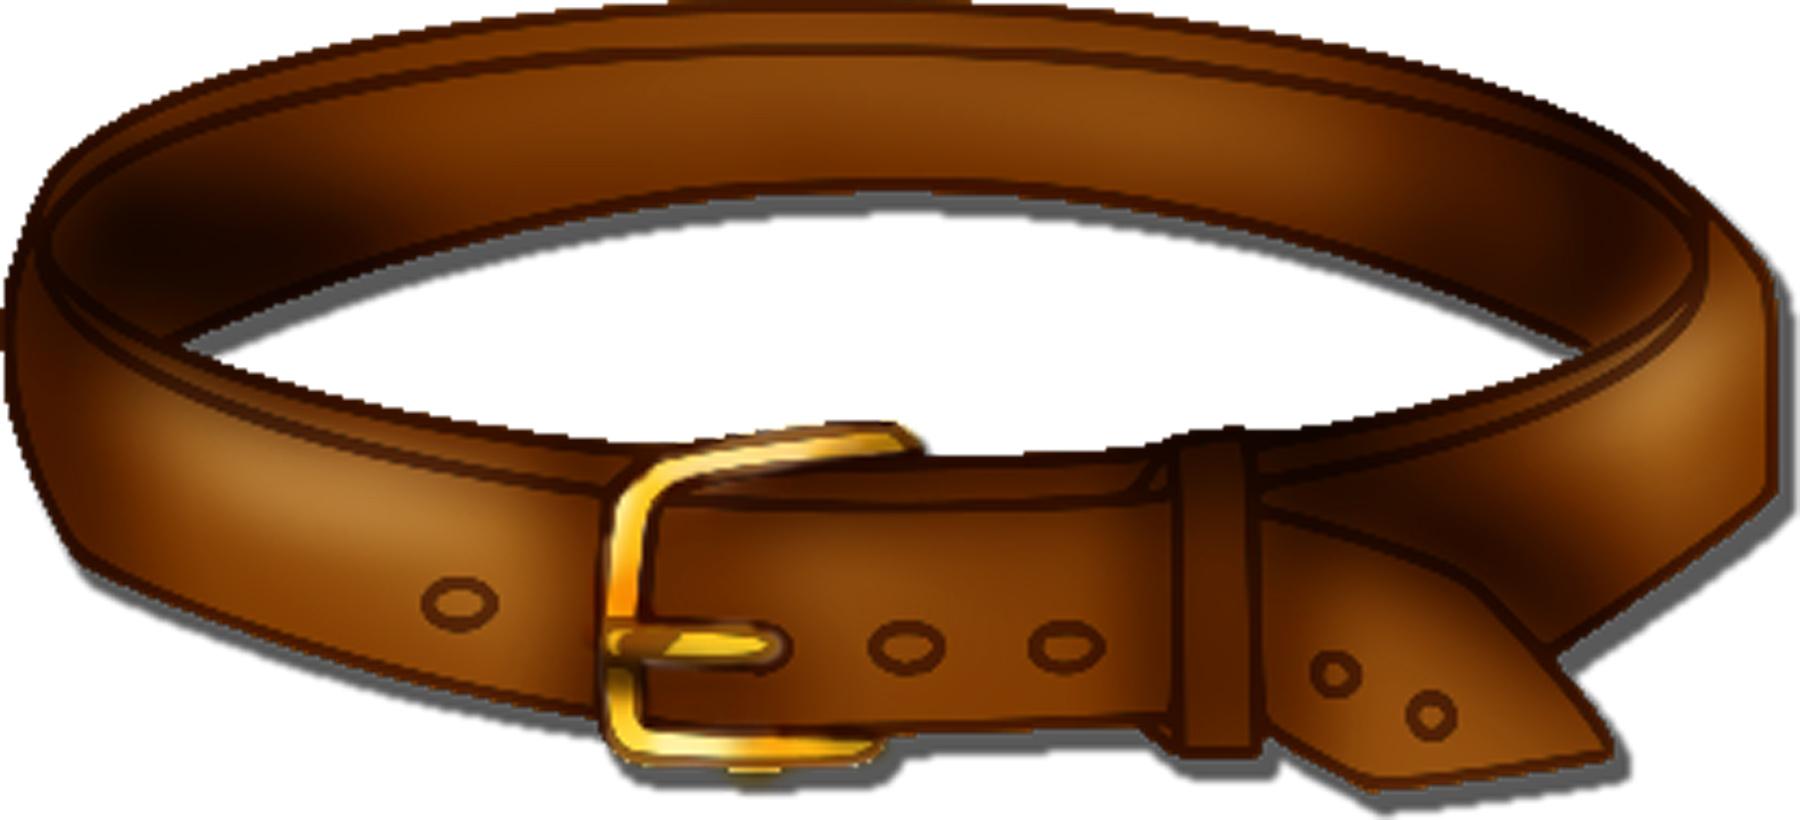 Free cliparts download clip. Belt clipart